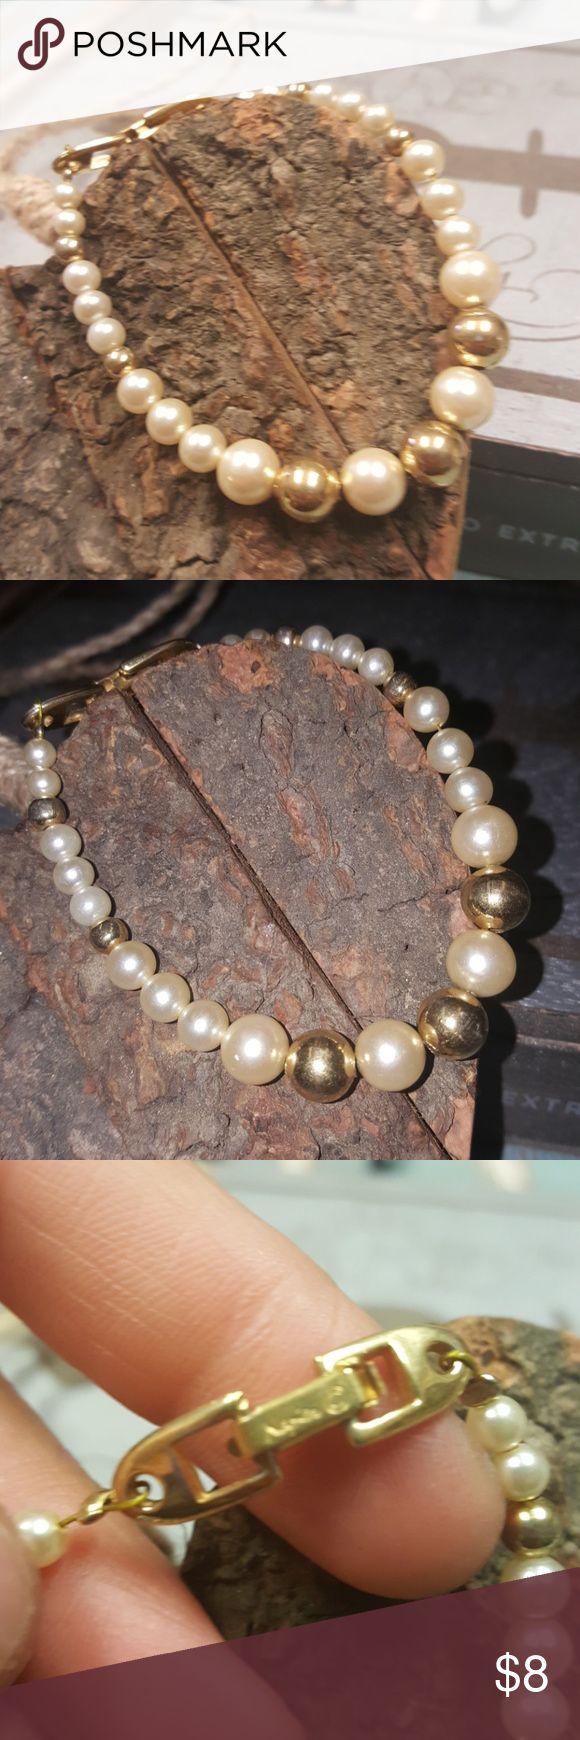 Vintage Napier Goldtone Faux Pearl Bracelet Vintage Napier Goldtone Faux Pearl Bracelet Napier Jewelry Bracelets